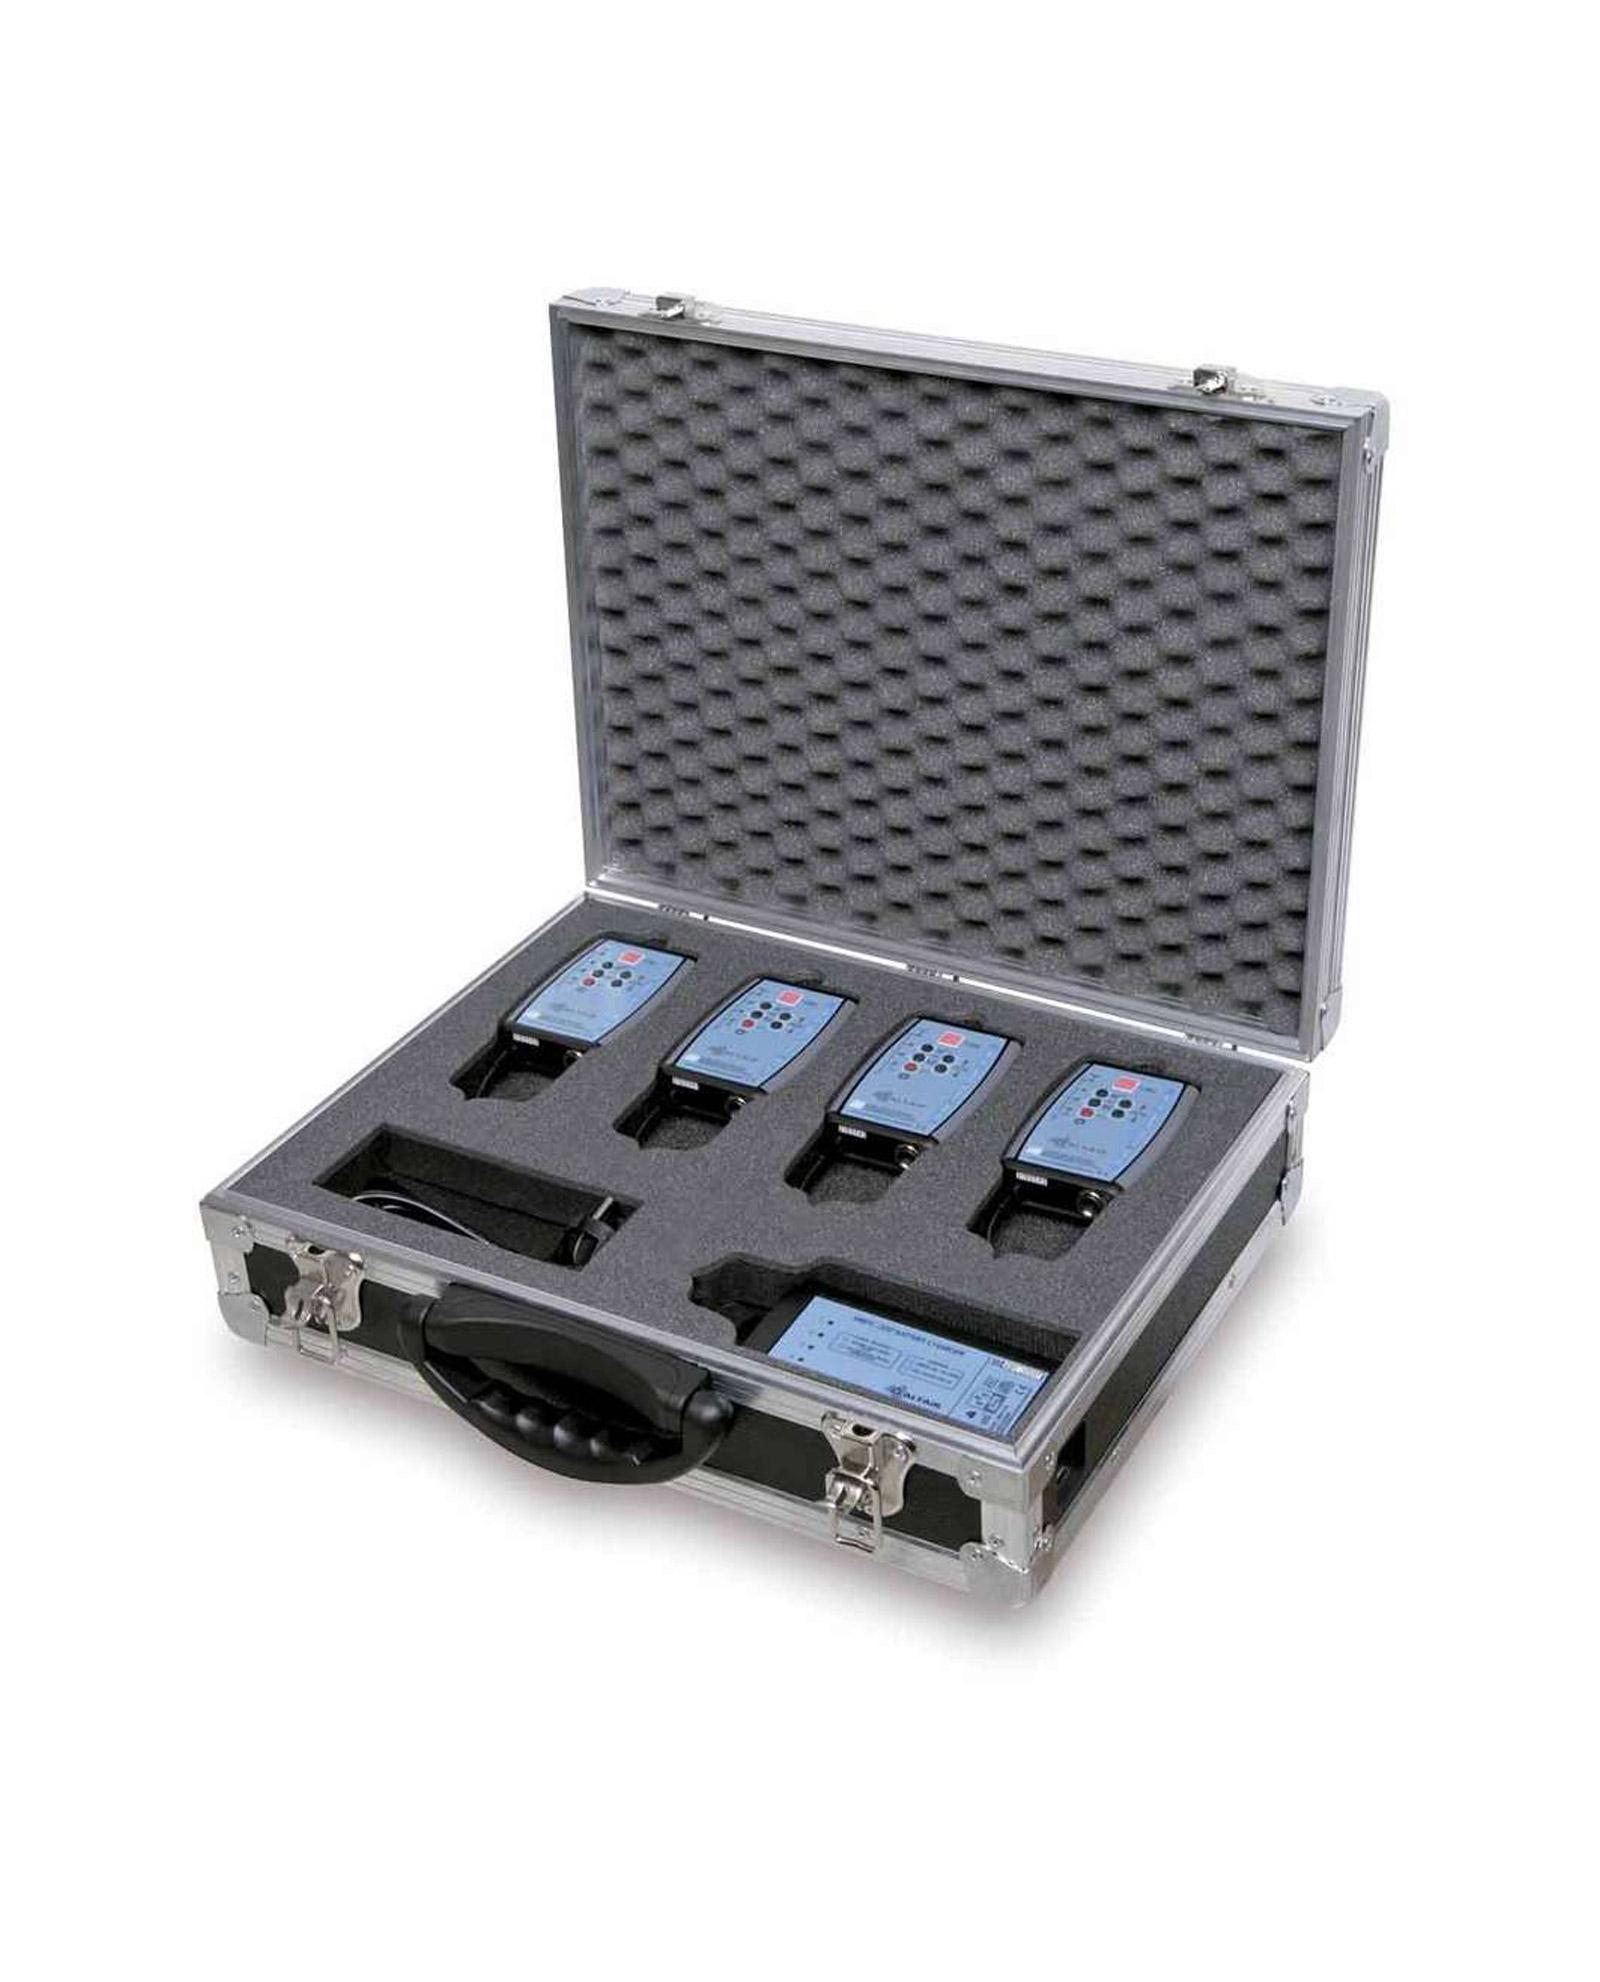 Altair Wbfc 200 Case